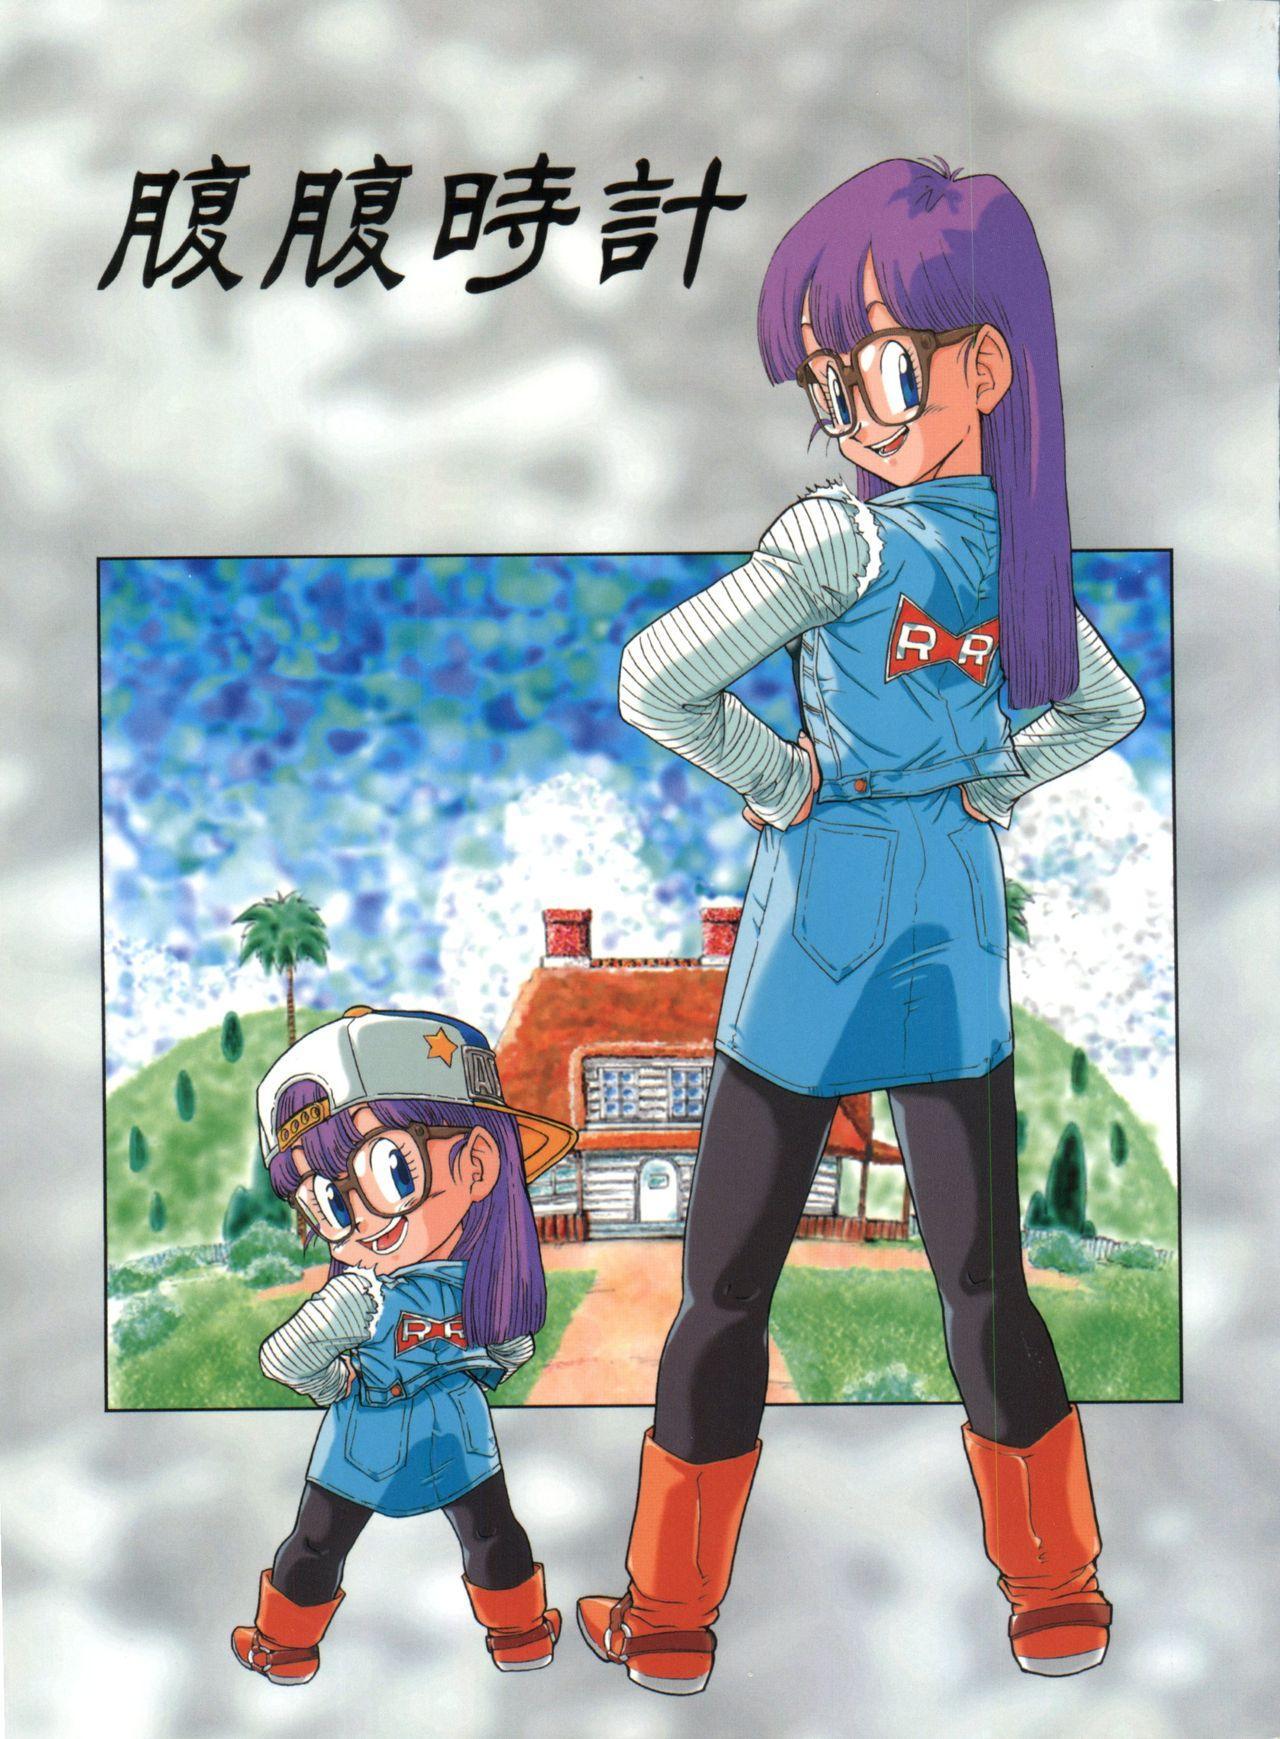 Hara Hara Dokei Vol. 4 Quattro 0